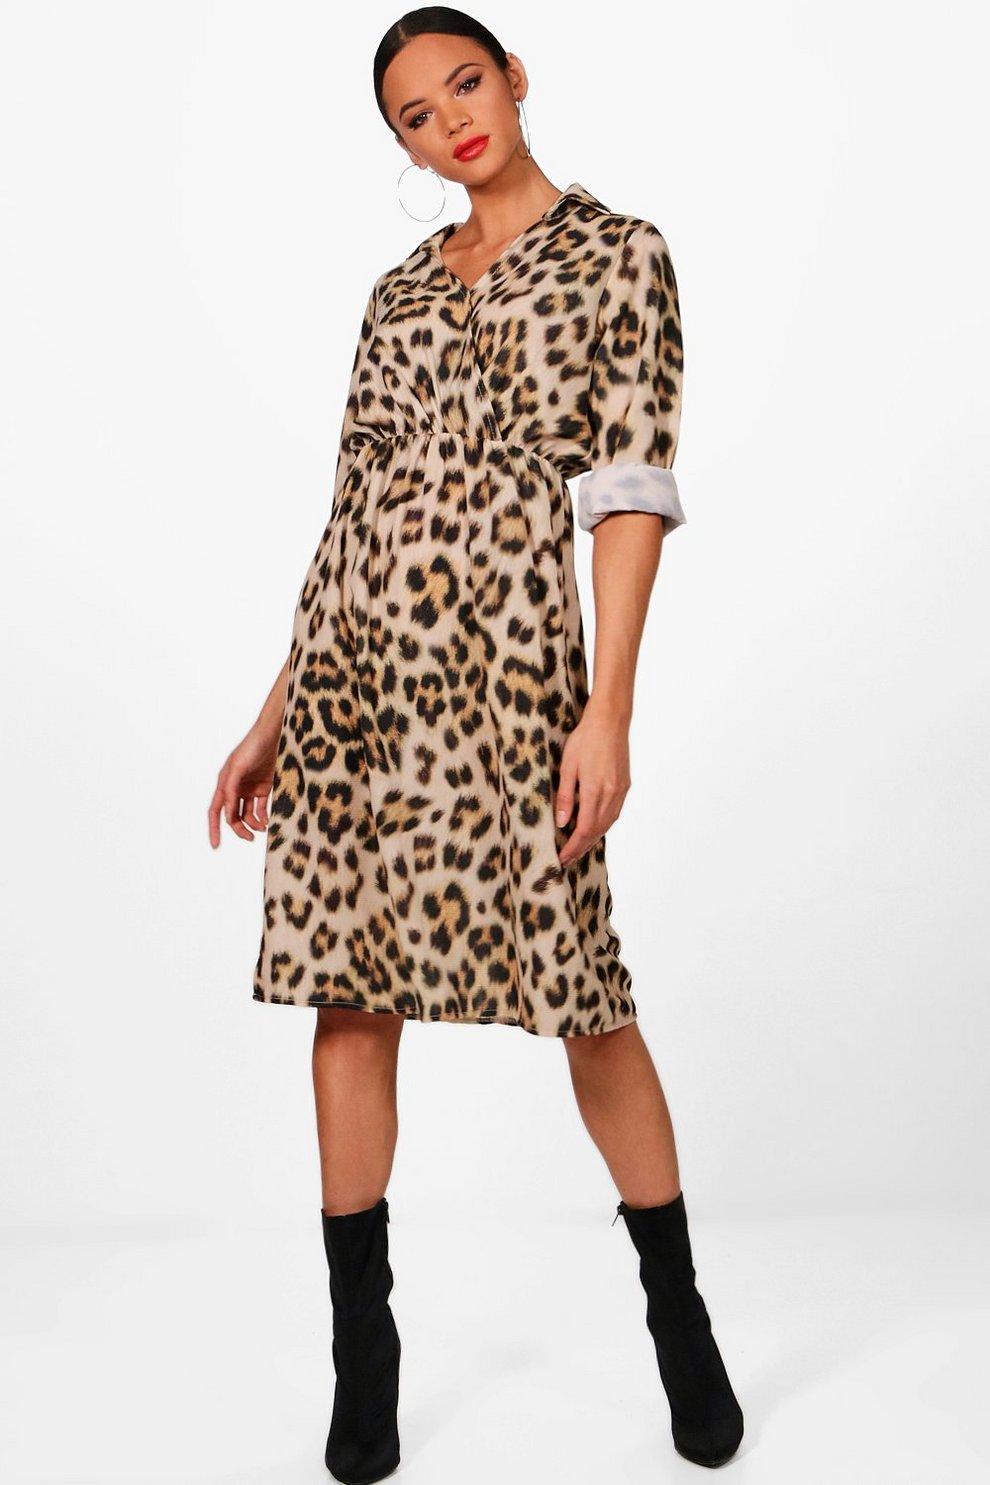 b326f3879e26 Luxe Satin Leopard Print Wrap Dress | Boohoo